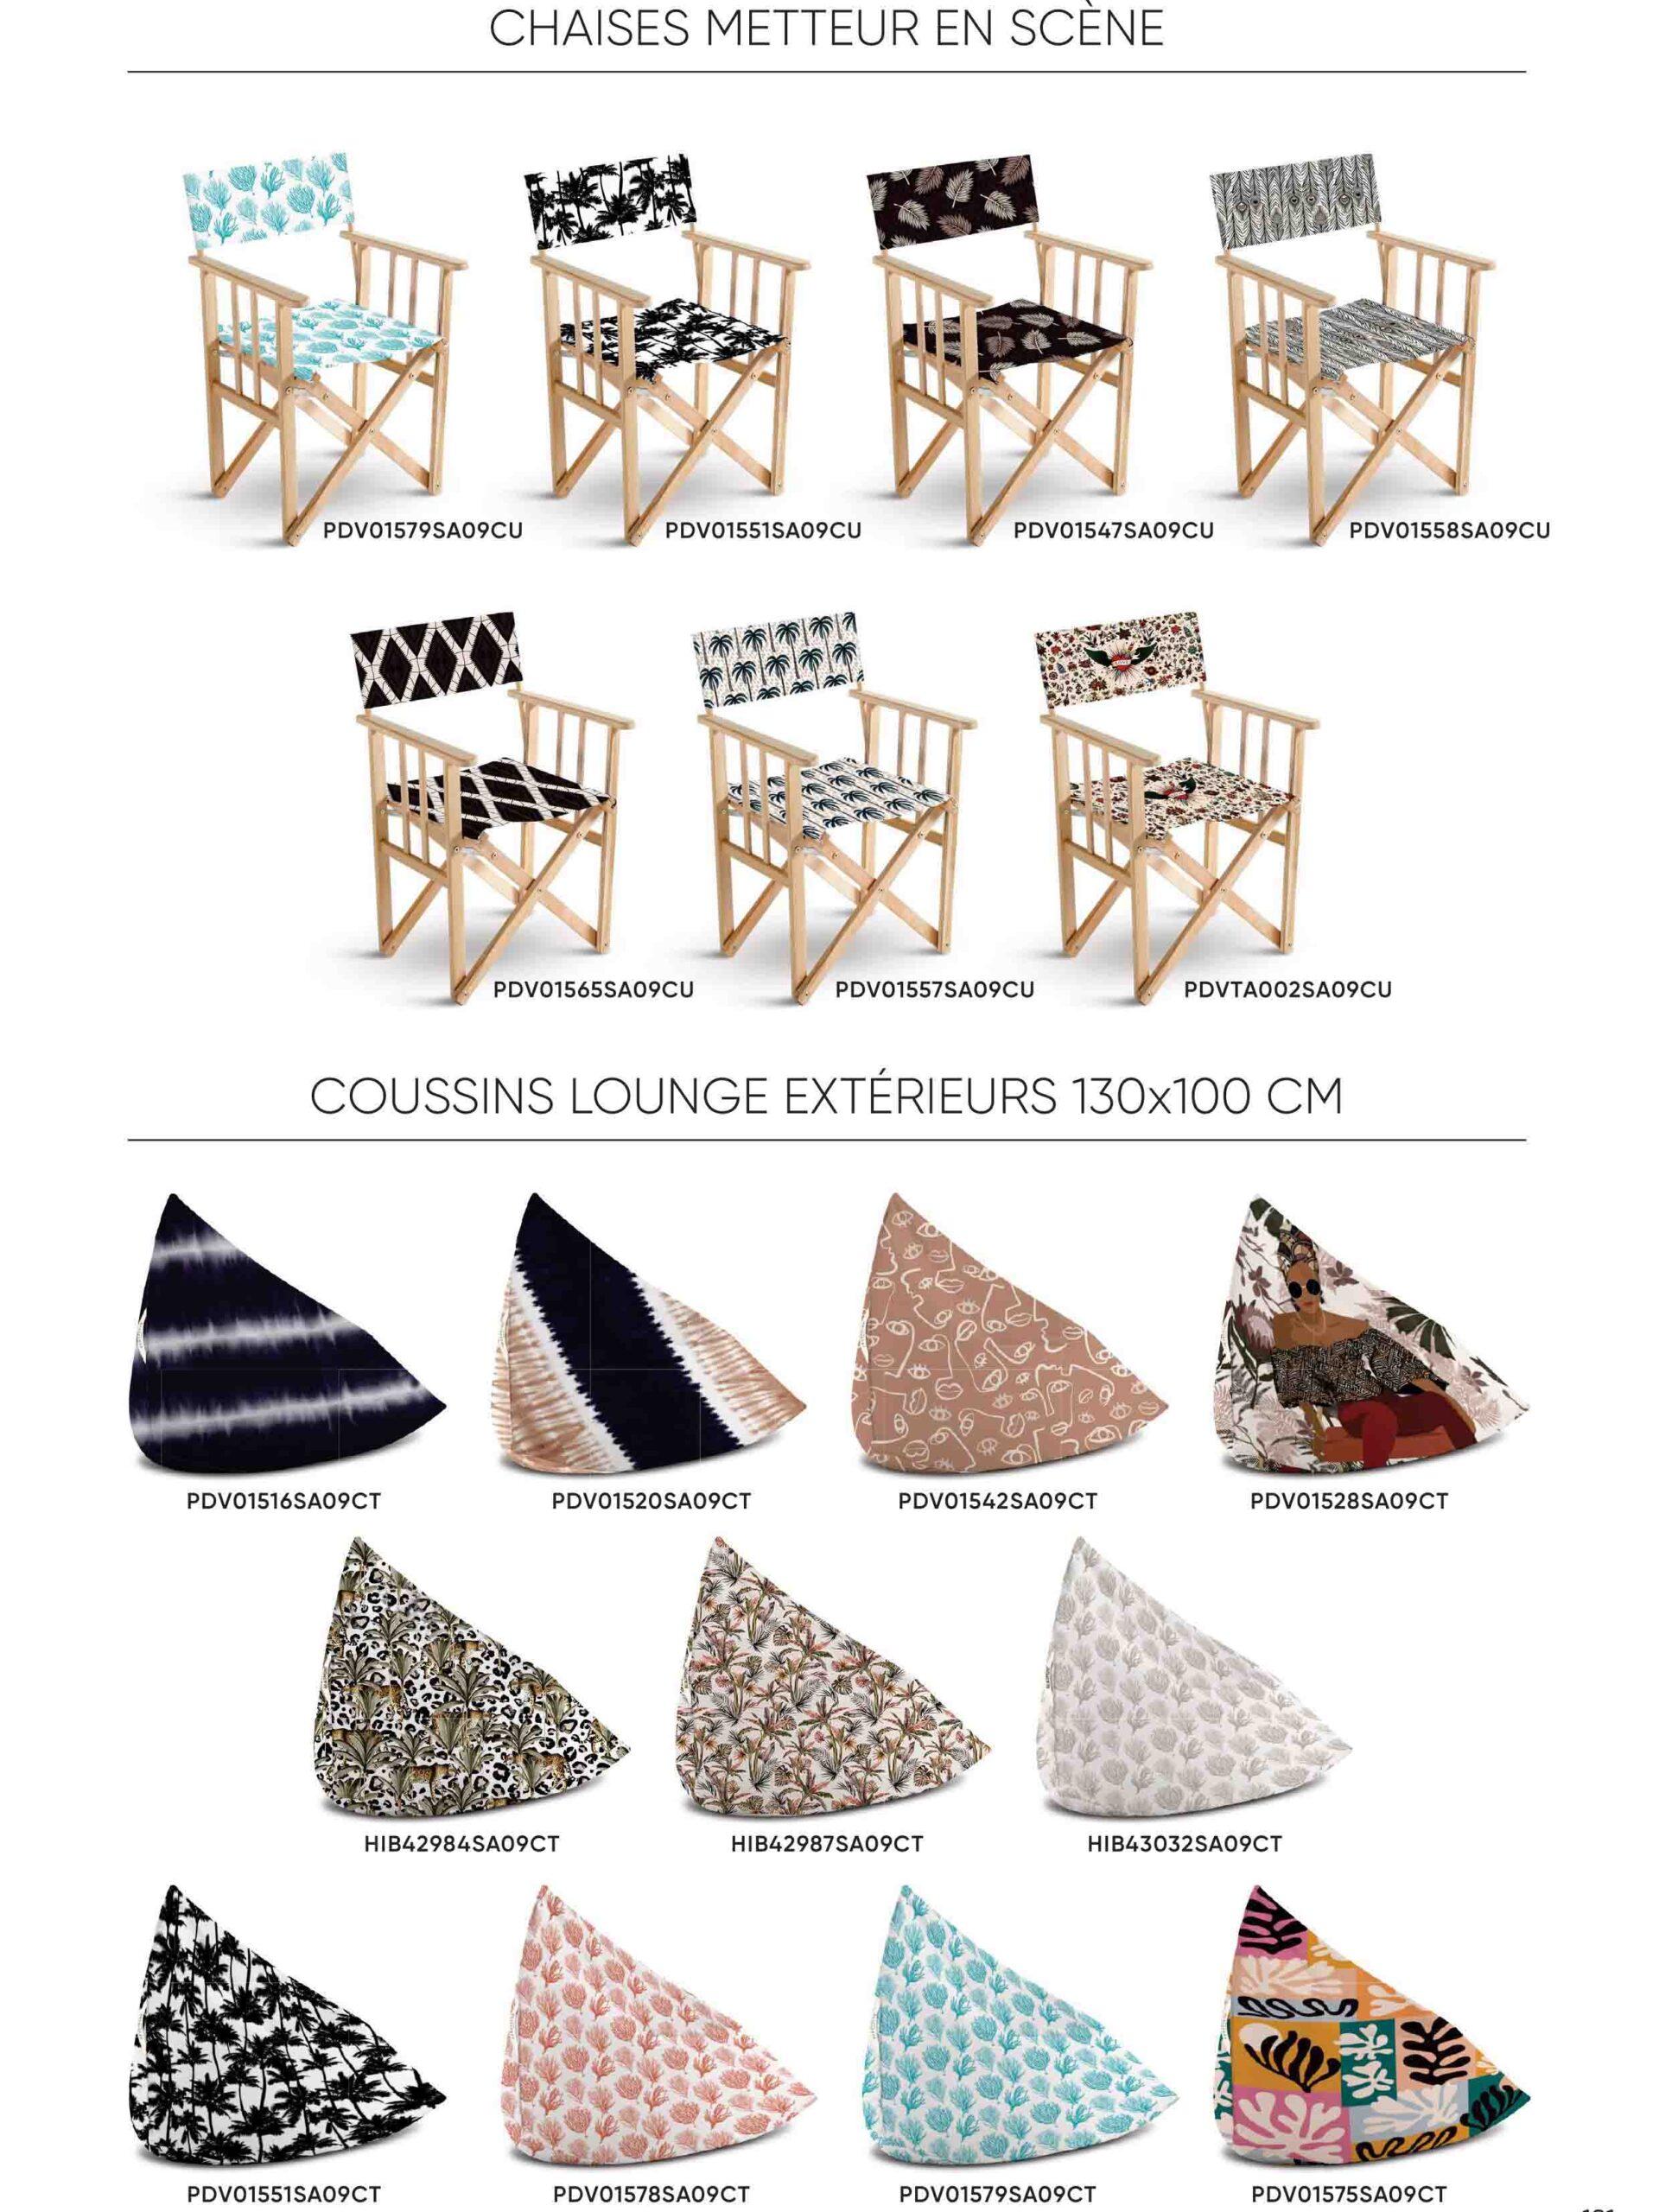 exterior puf lounge hamaca sombrilla cojines ibiza c5 10